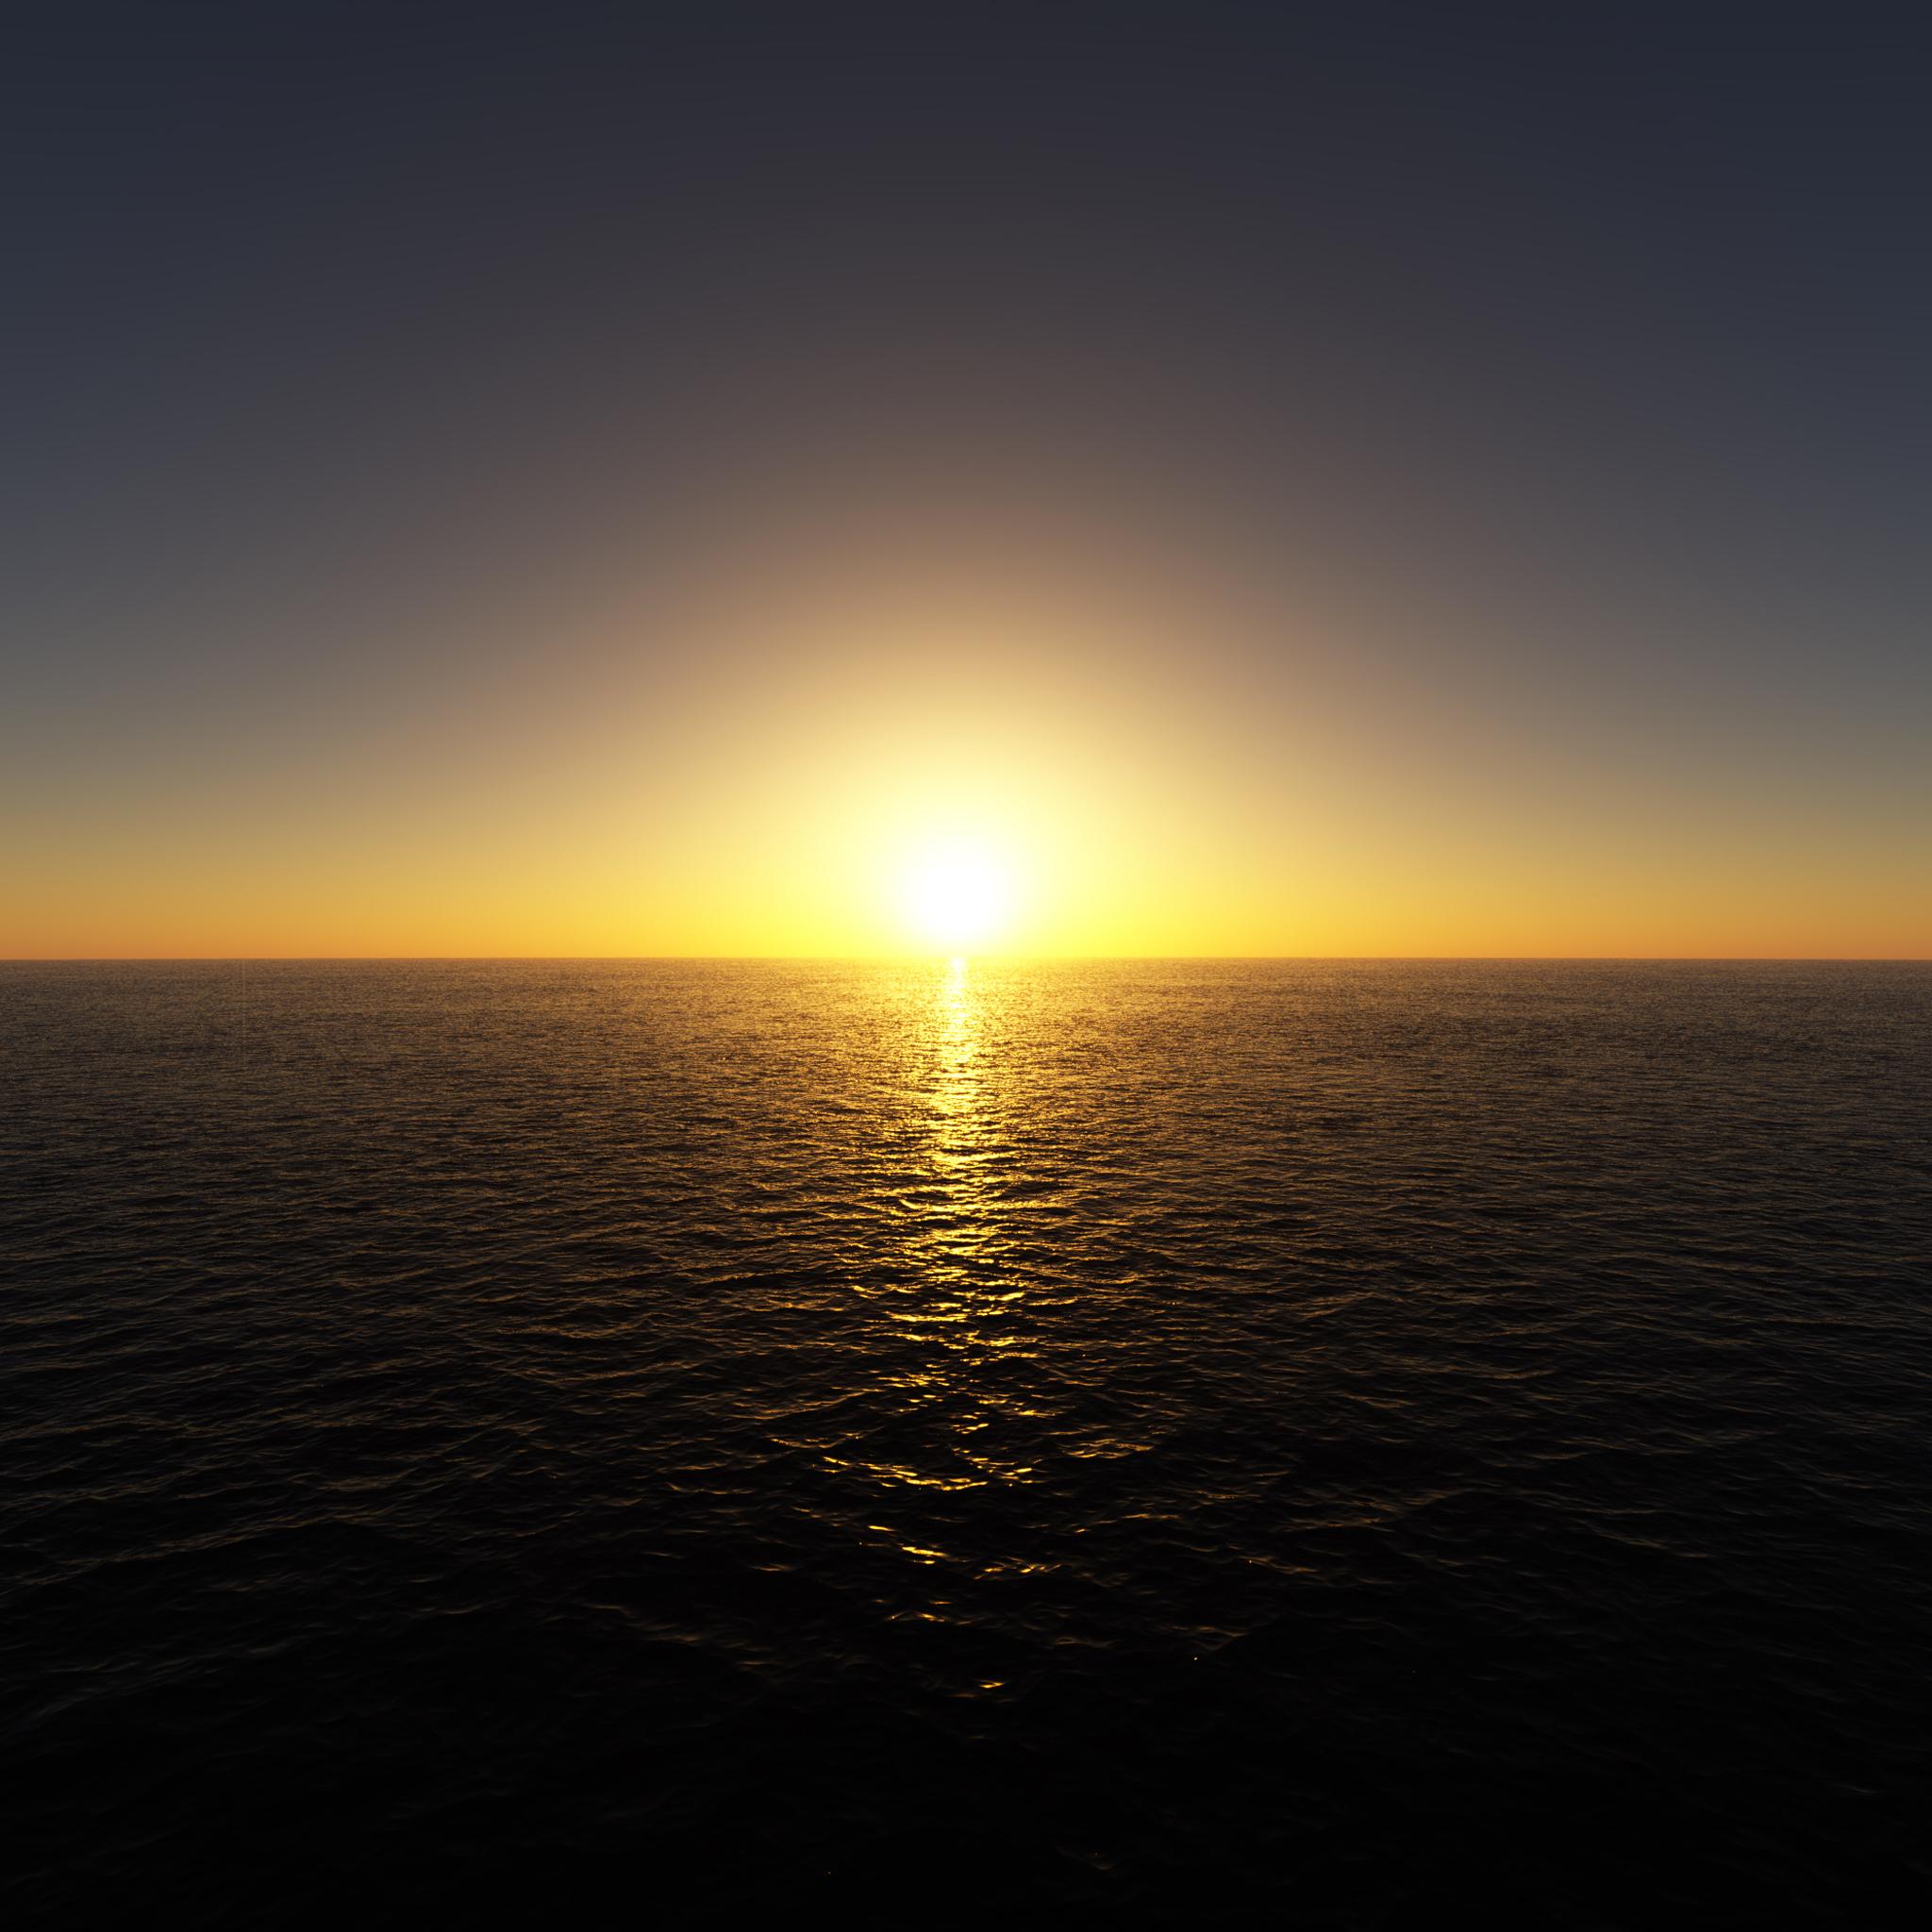 Sunrise-3Wallpapers-iPad-Retina